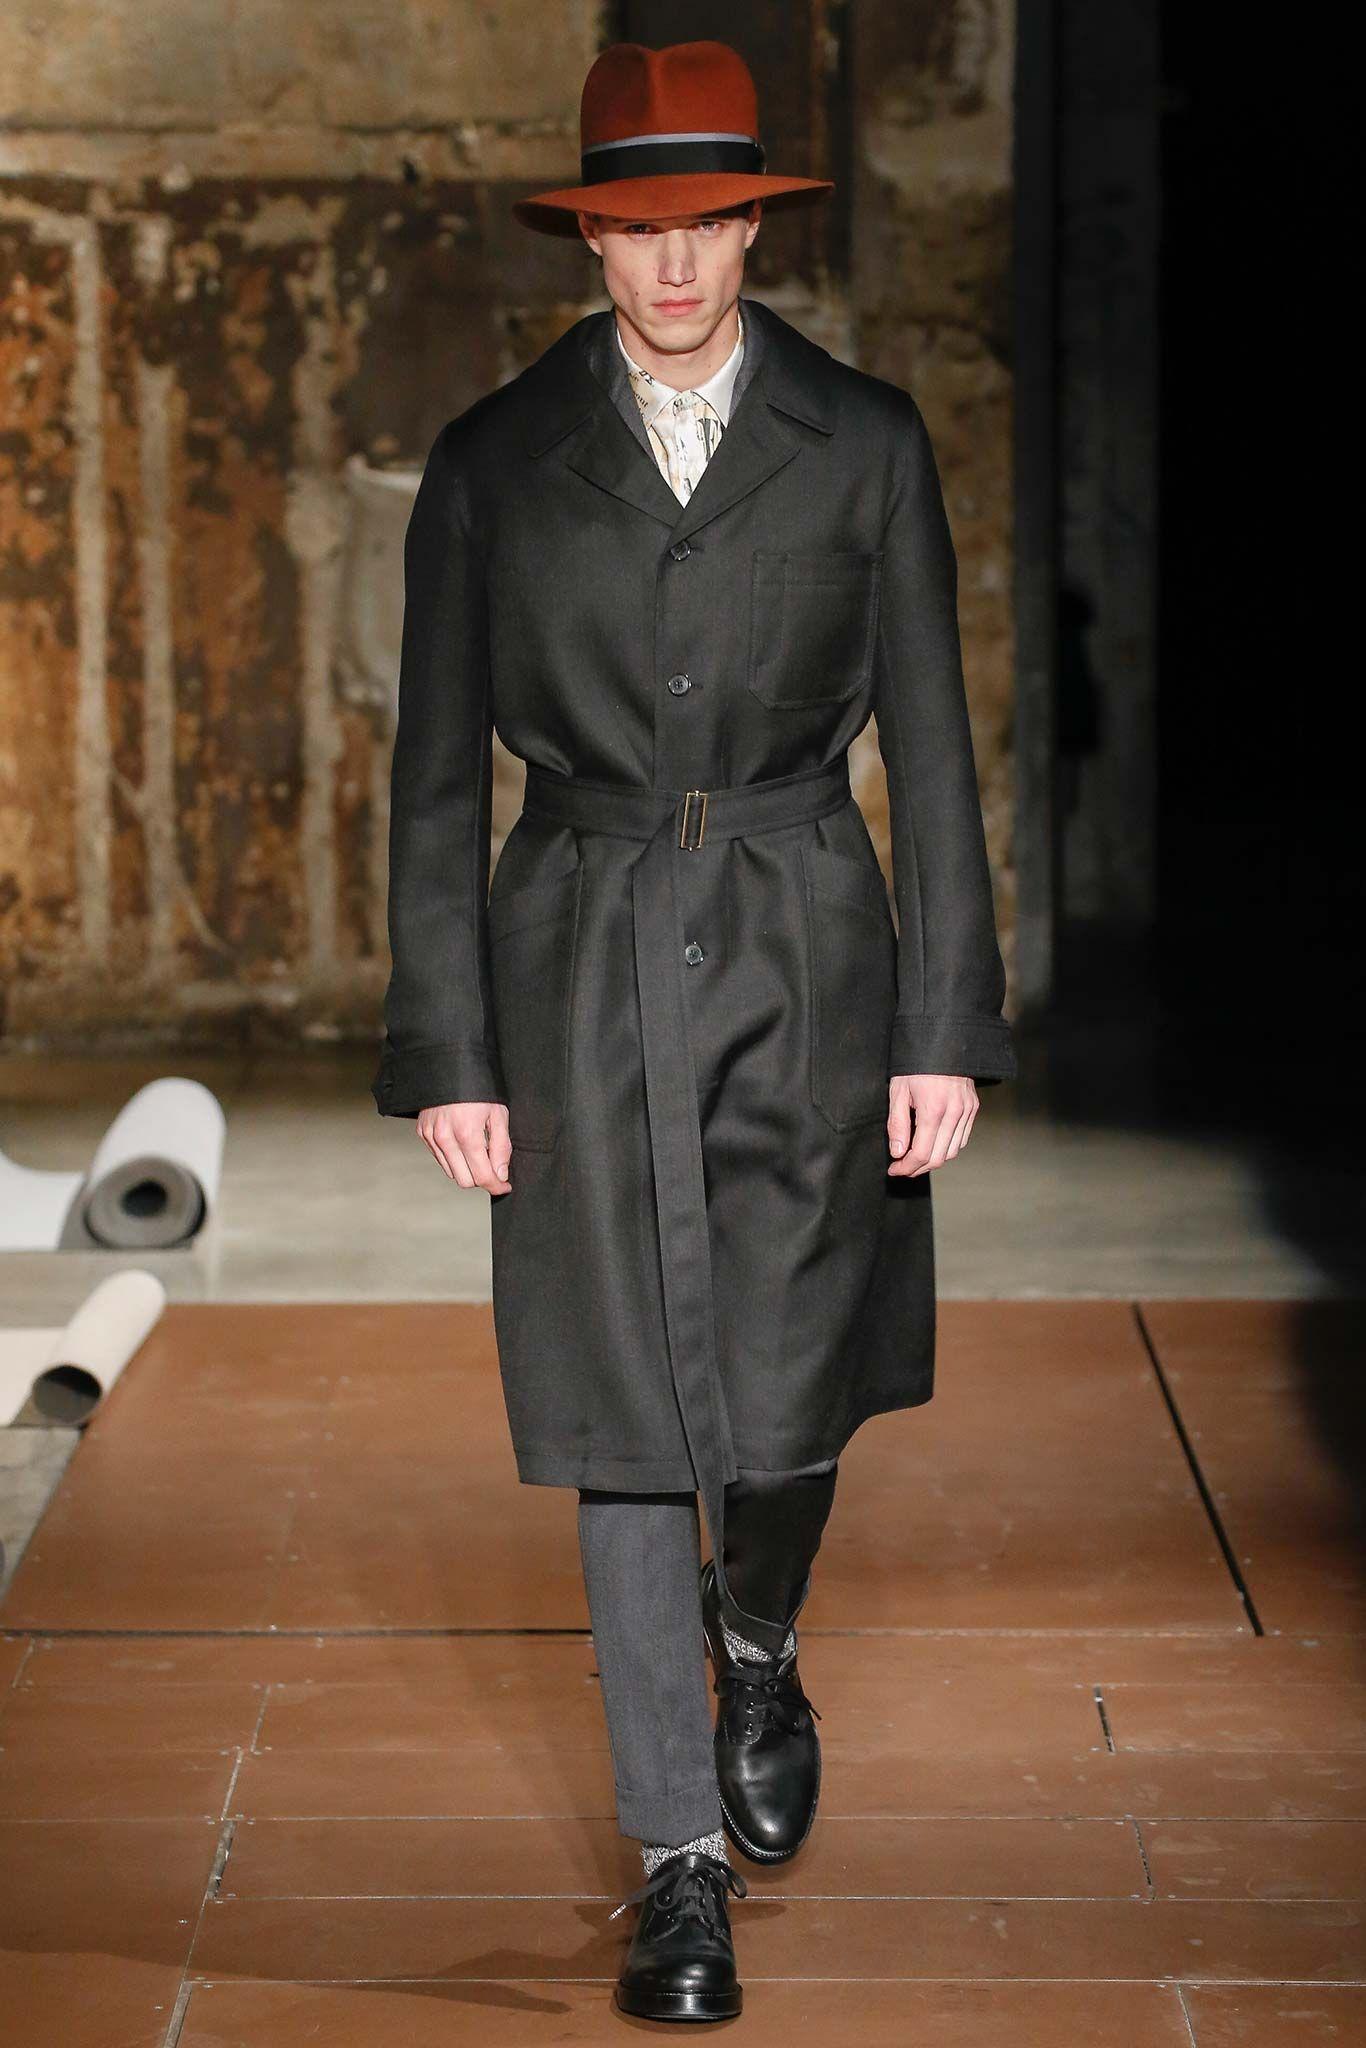 Cerruti 1881 Paris - Fall 2015 Menswear - Look 21 of 25